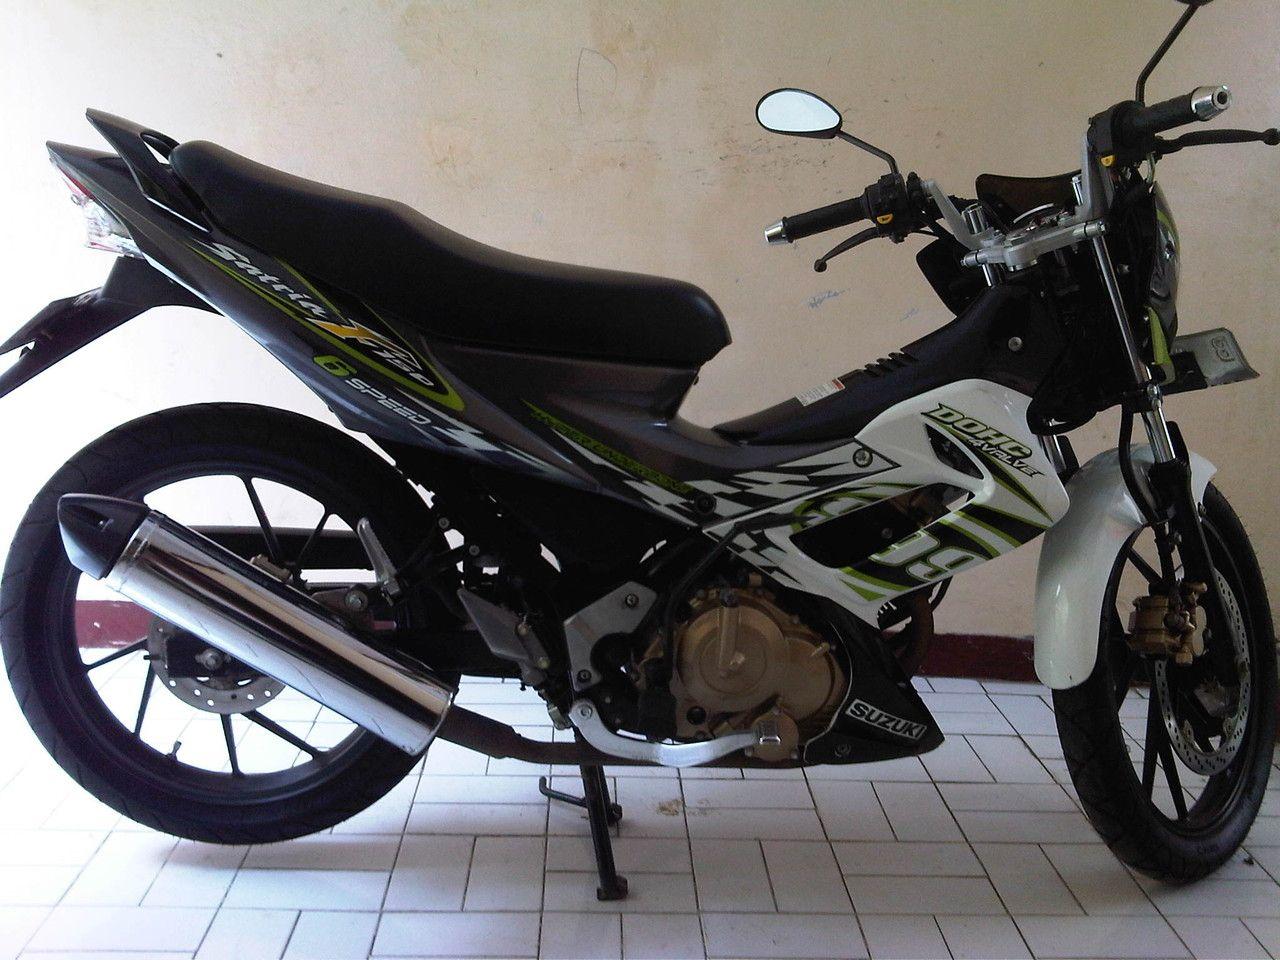 Suzuki Fu 150 Raider Satria Belang My Dream Pinterest All New Cb 150r Streetfire Stallion Black Bekasi